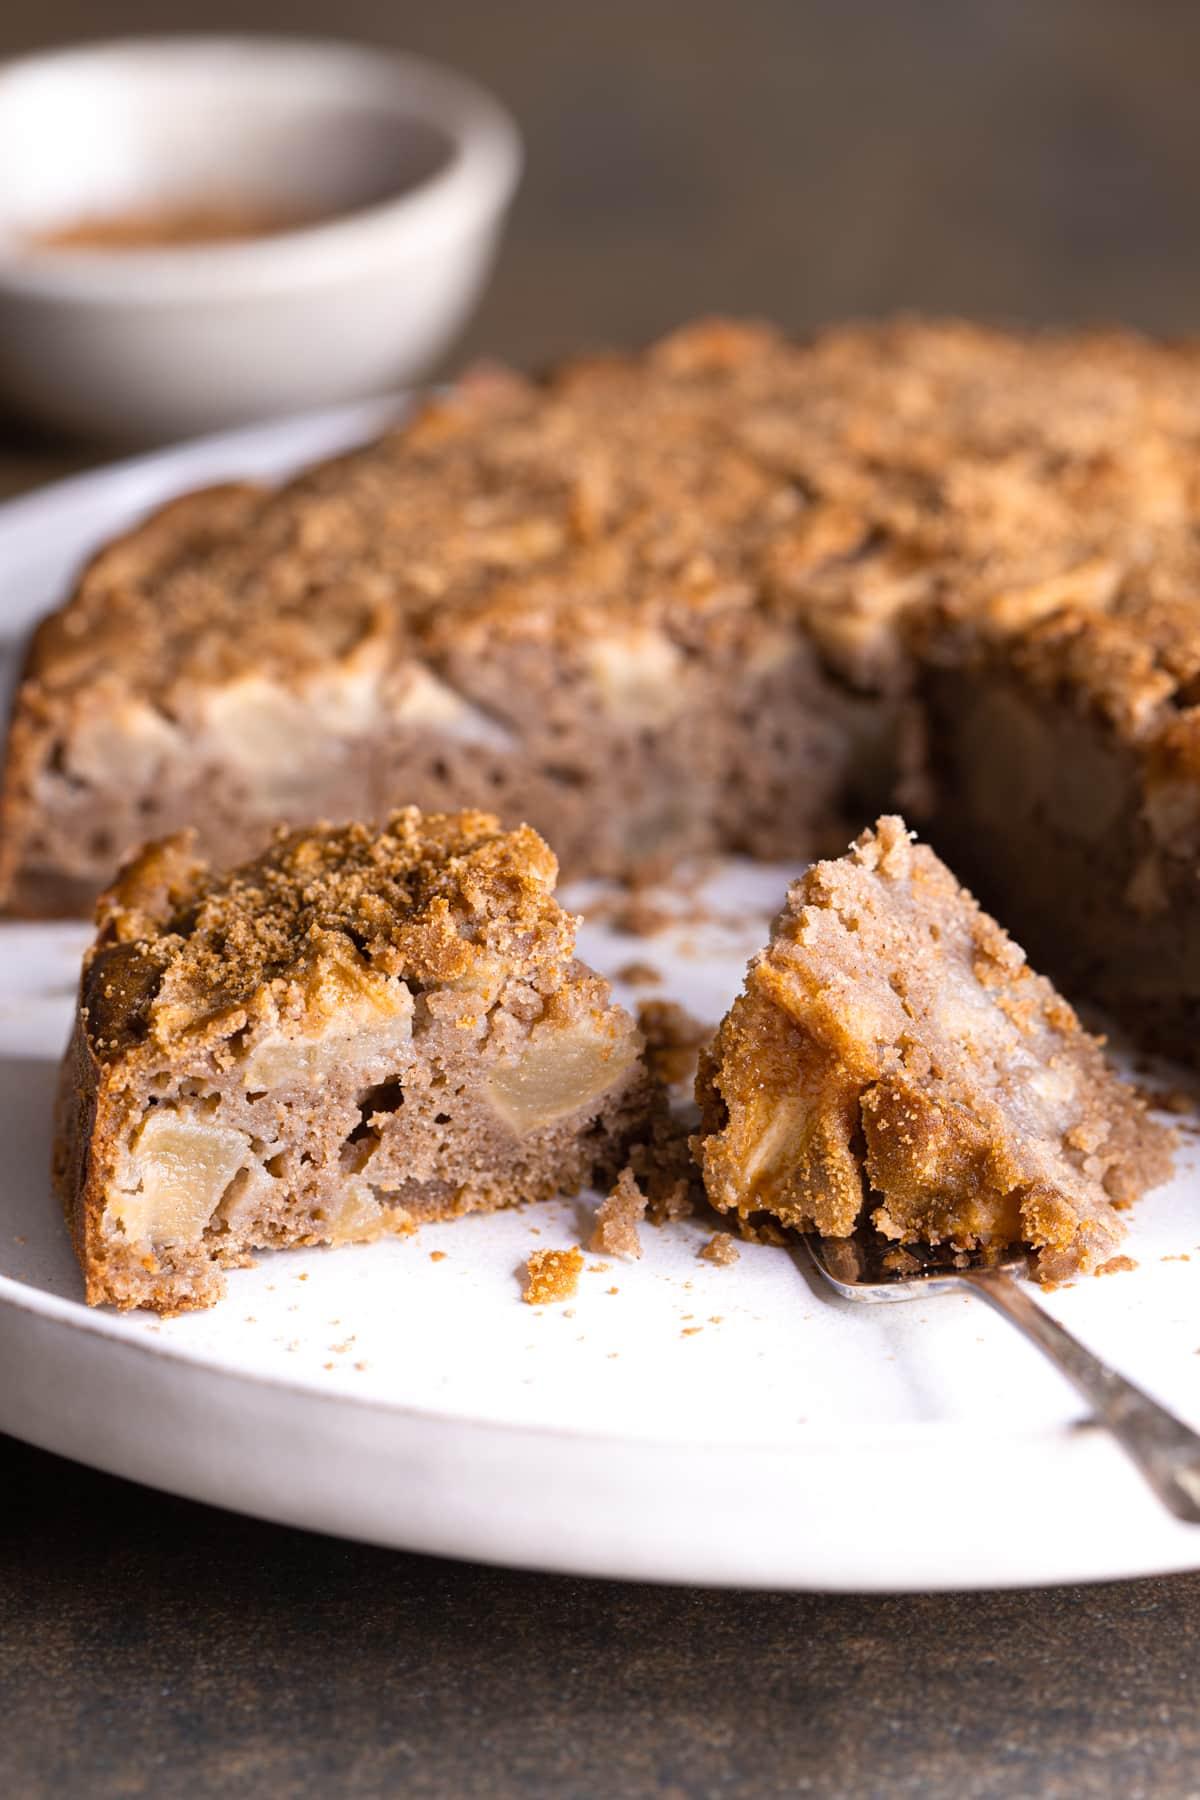 Gluten Free Apple Cake with Buckwheat Flour